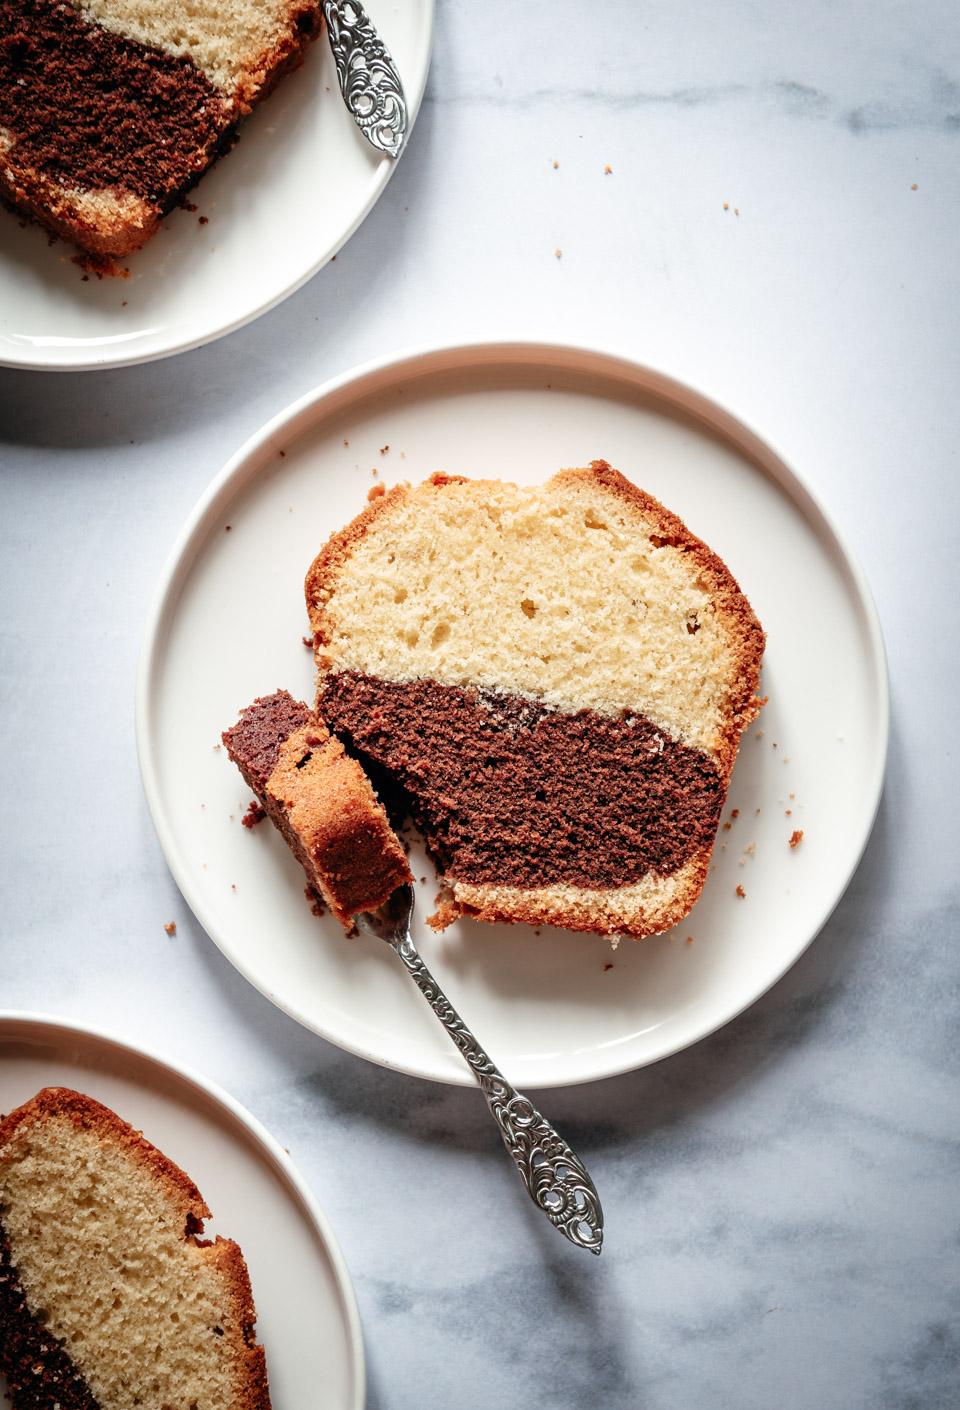 Plakje vanille en chocolade cake